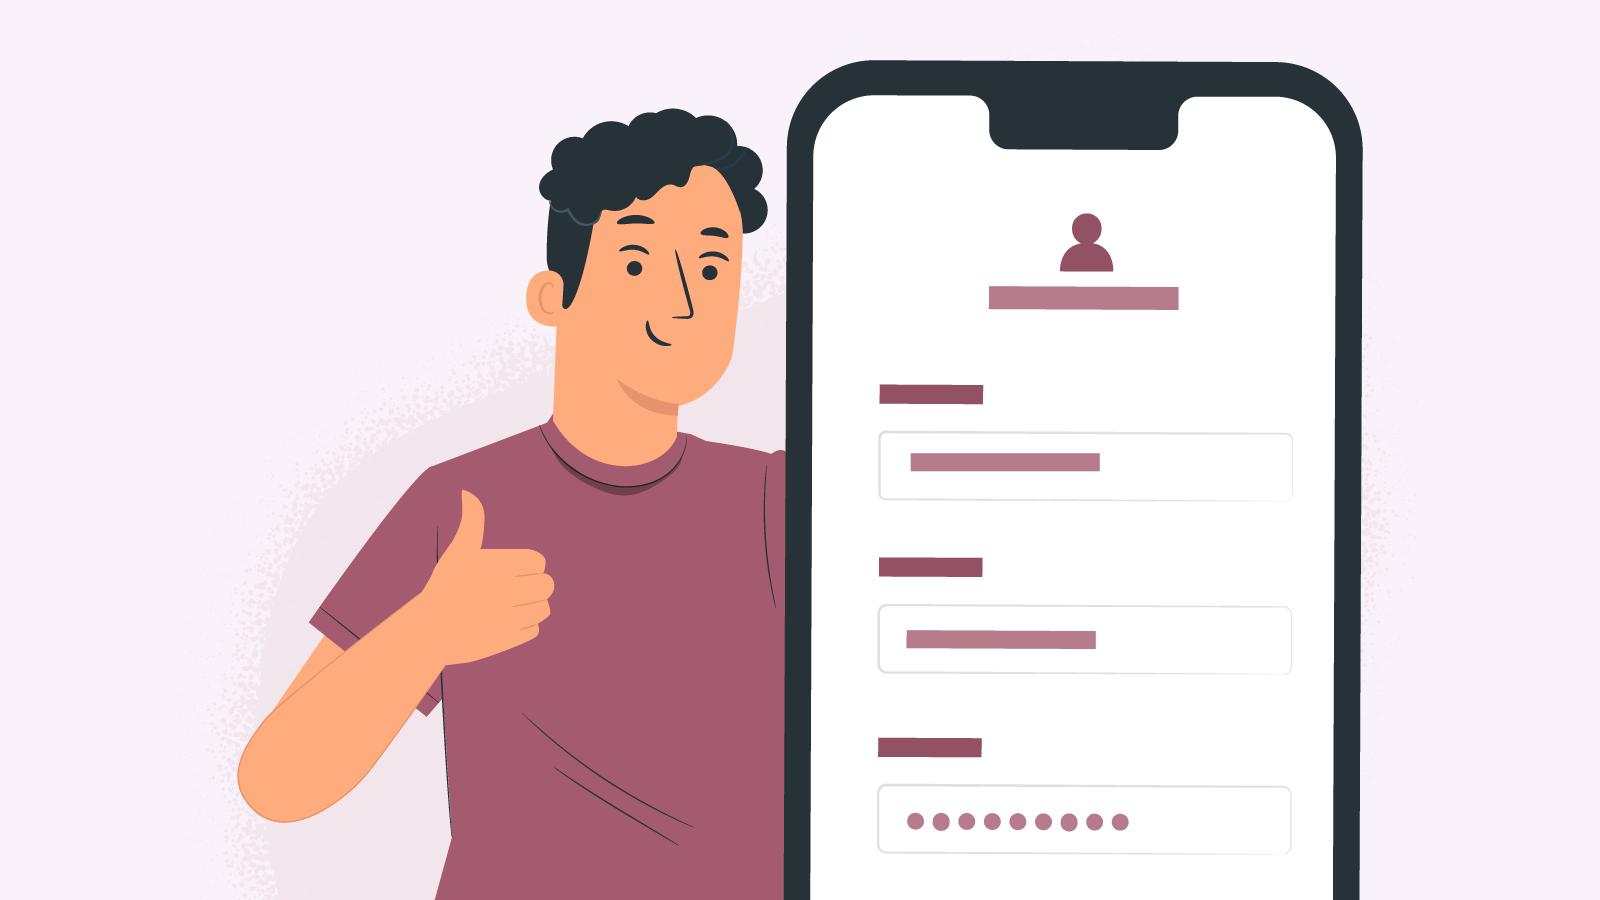 Account maintenance and identity checks